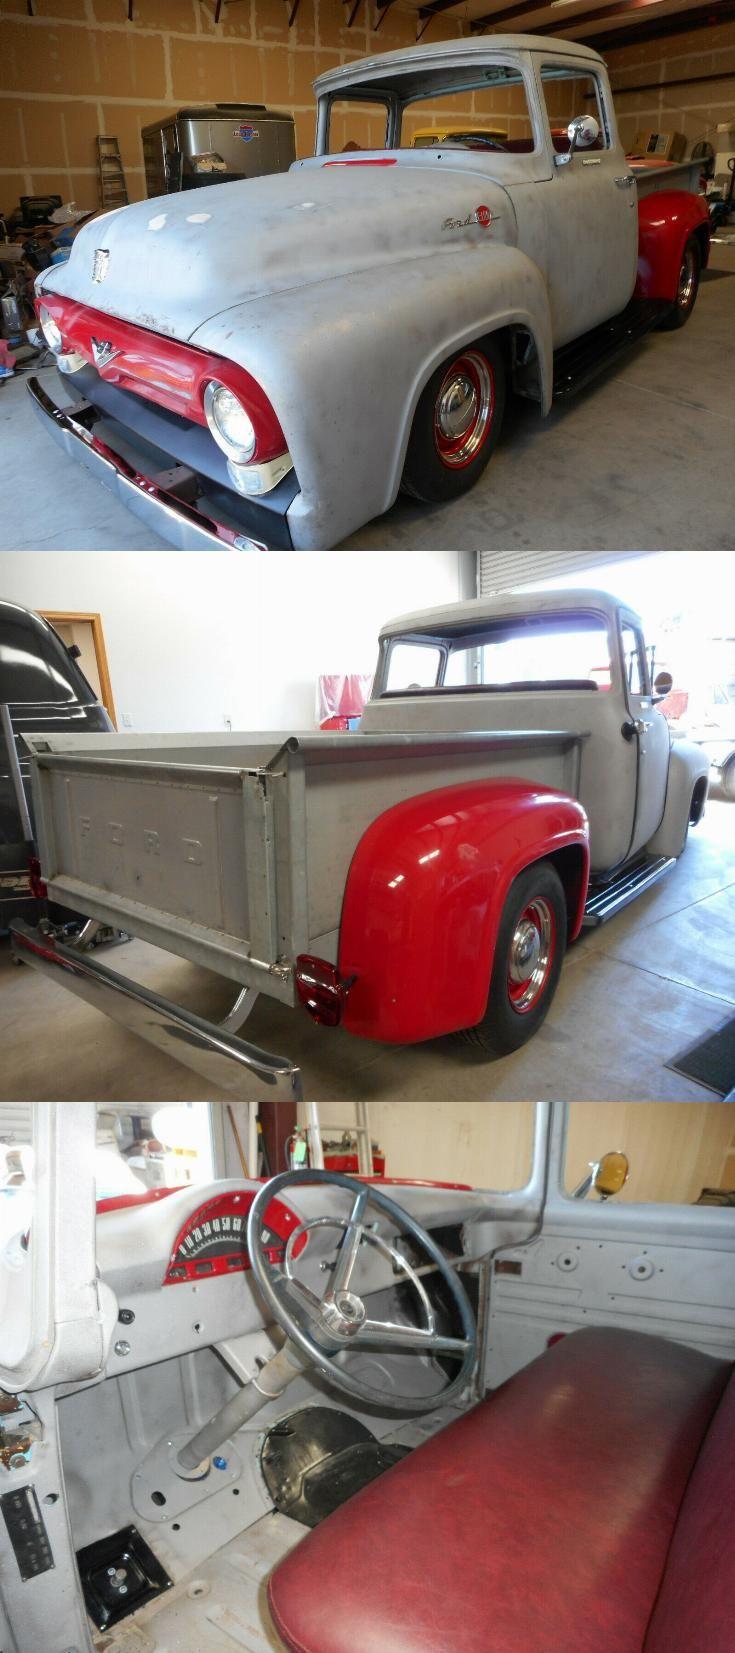 Custom 1956 Ford F 100 Big Window Pickup Project Project Cars For Sale Vintage Trucks For Sale Big Windows